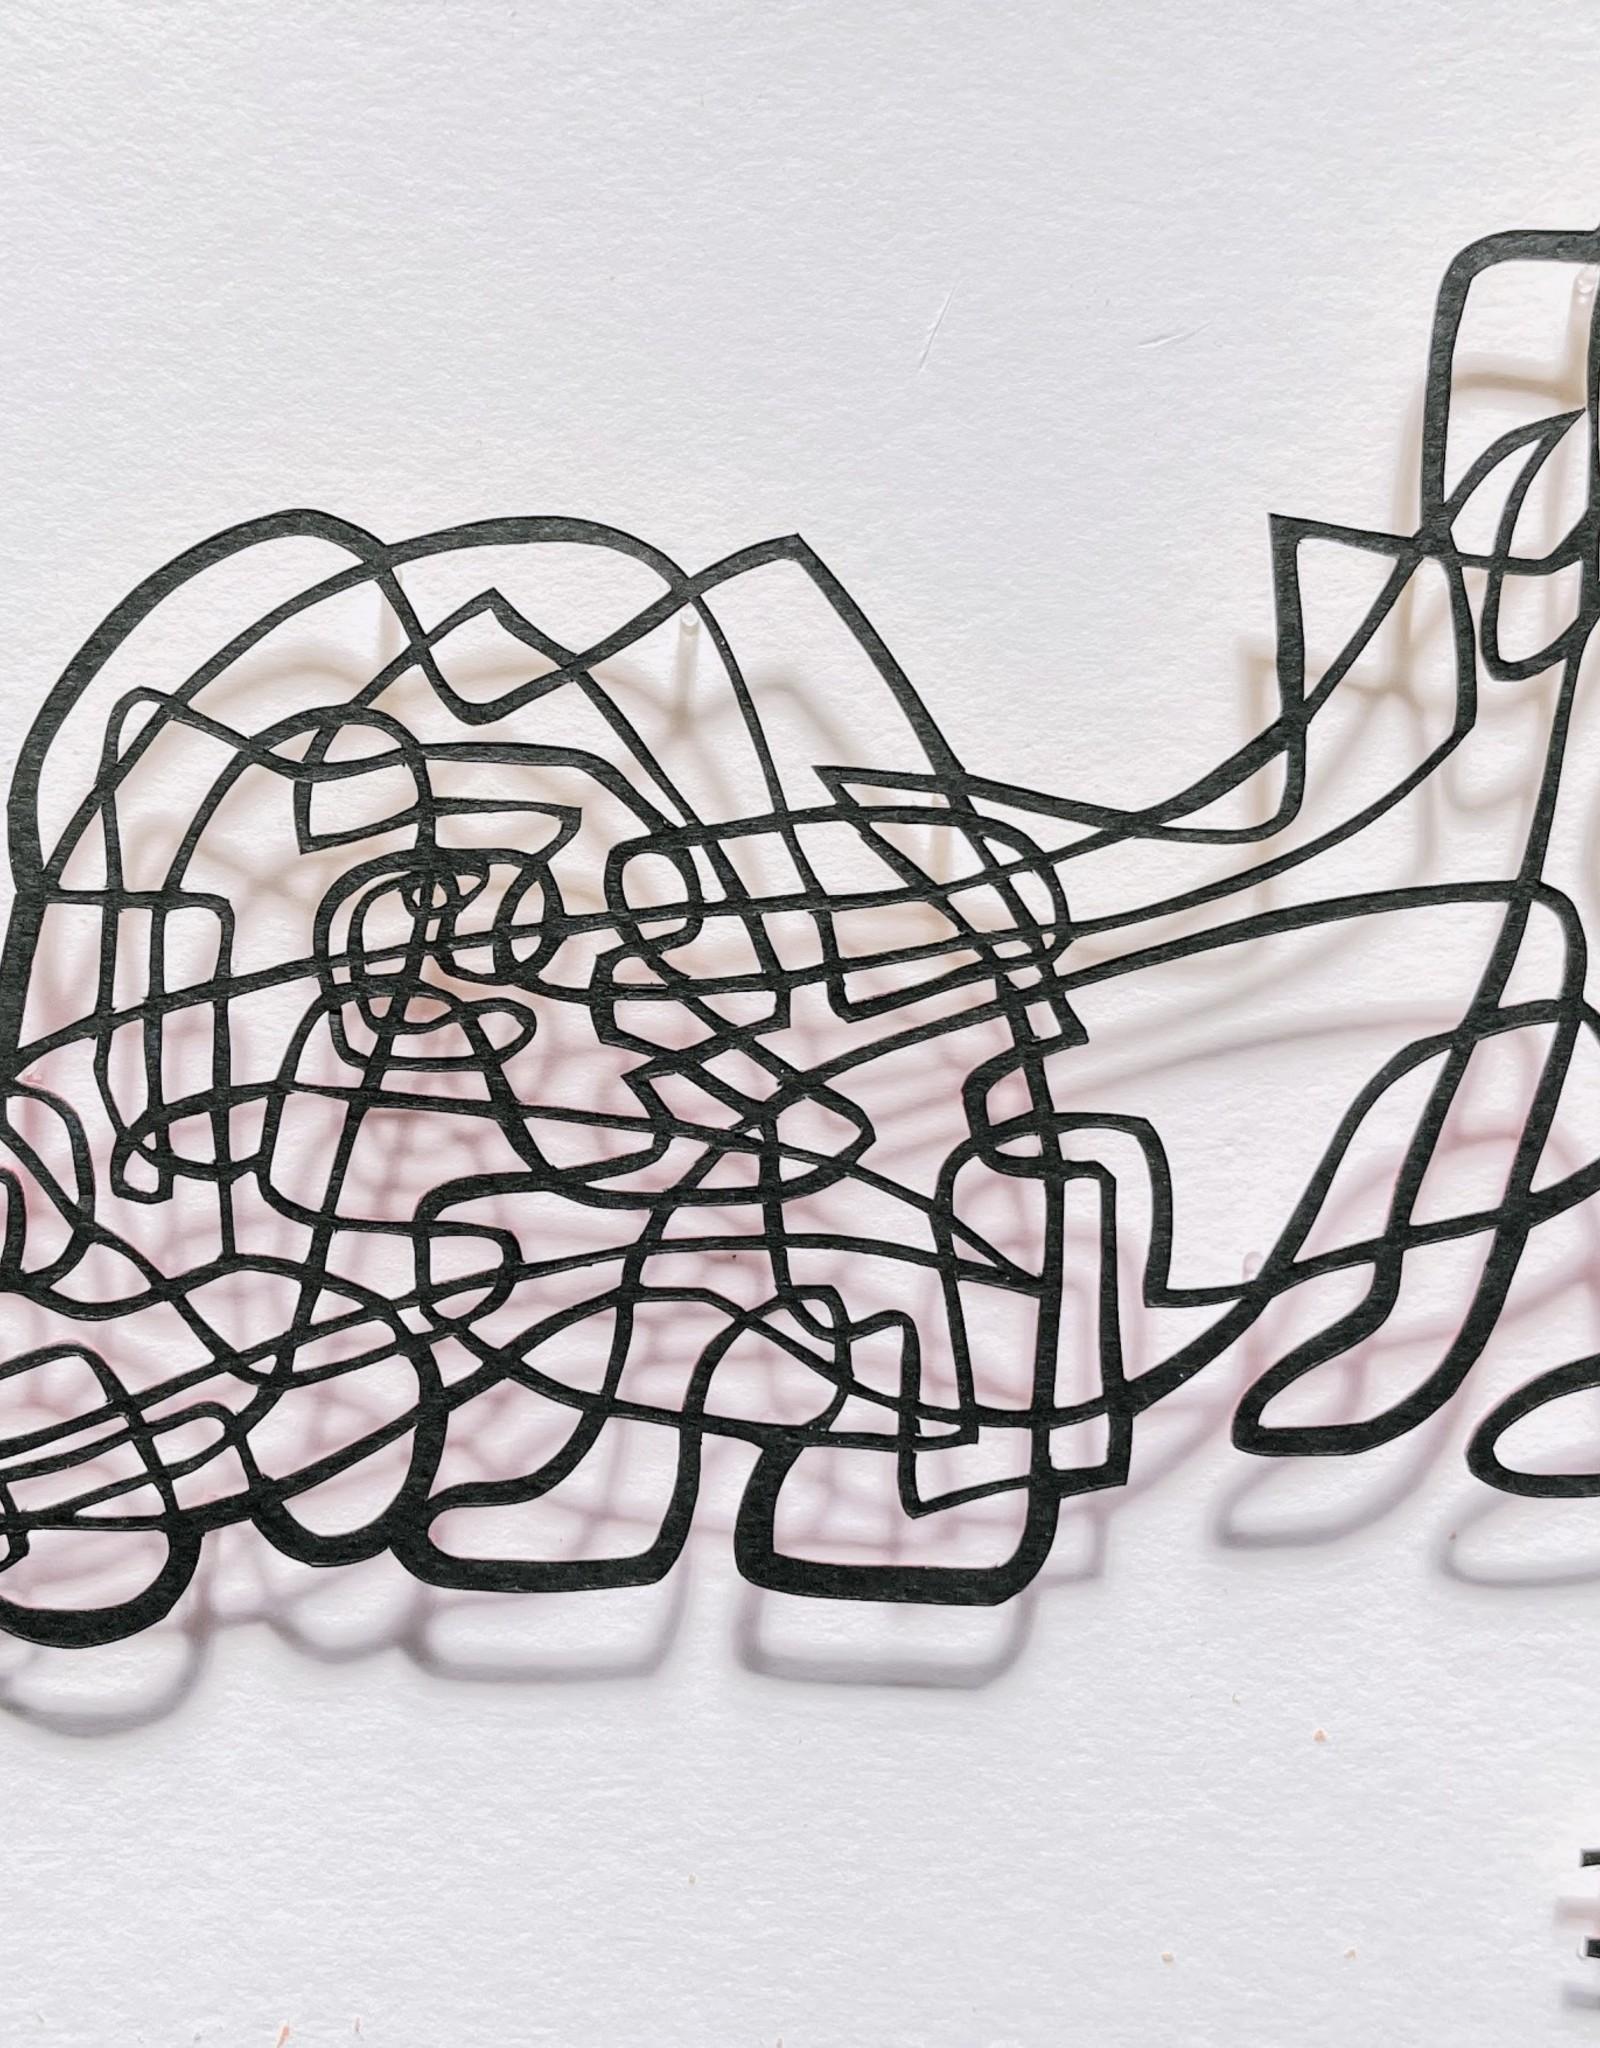 David Friedman Sniffer - Papercutting